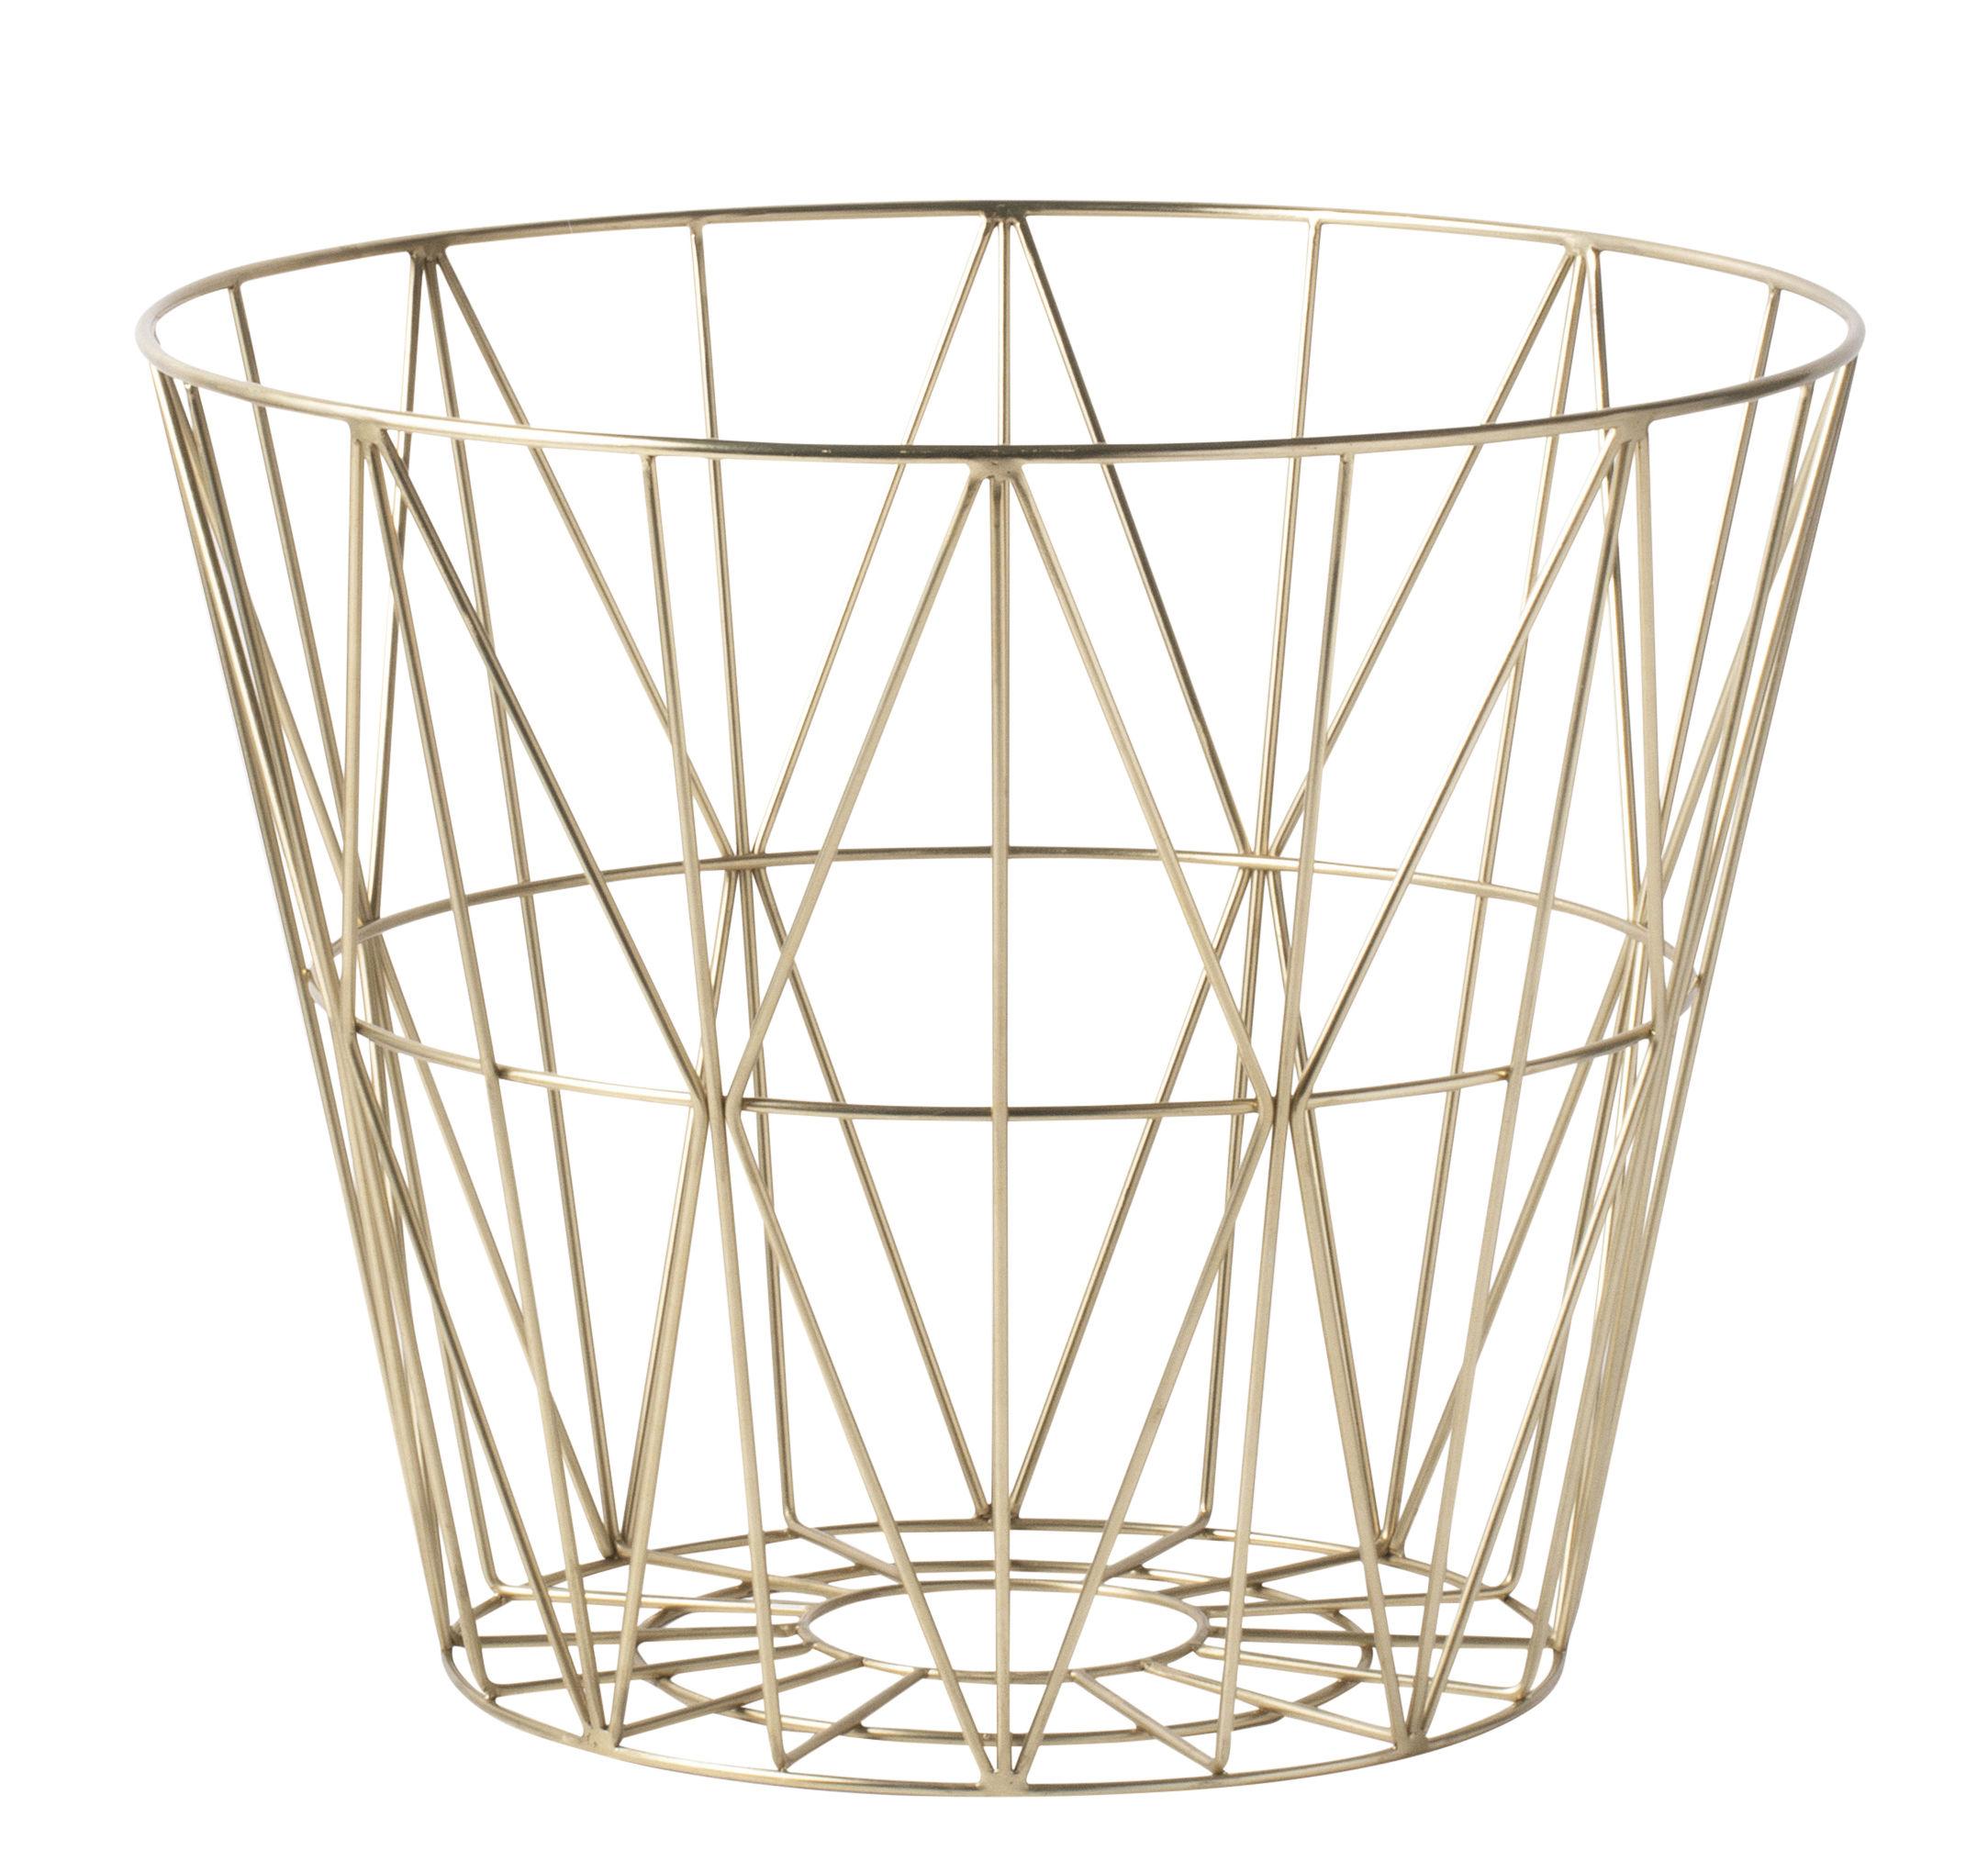 Interni - Cestini e Centrotavola  - Cestino Wire Medium / Ø 50 x H 40 cm - Ferm Living - Ottone - Métal plaqué laiton